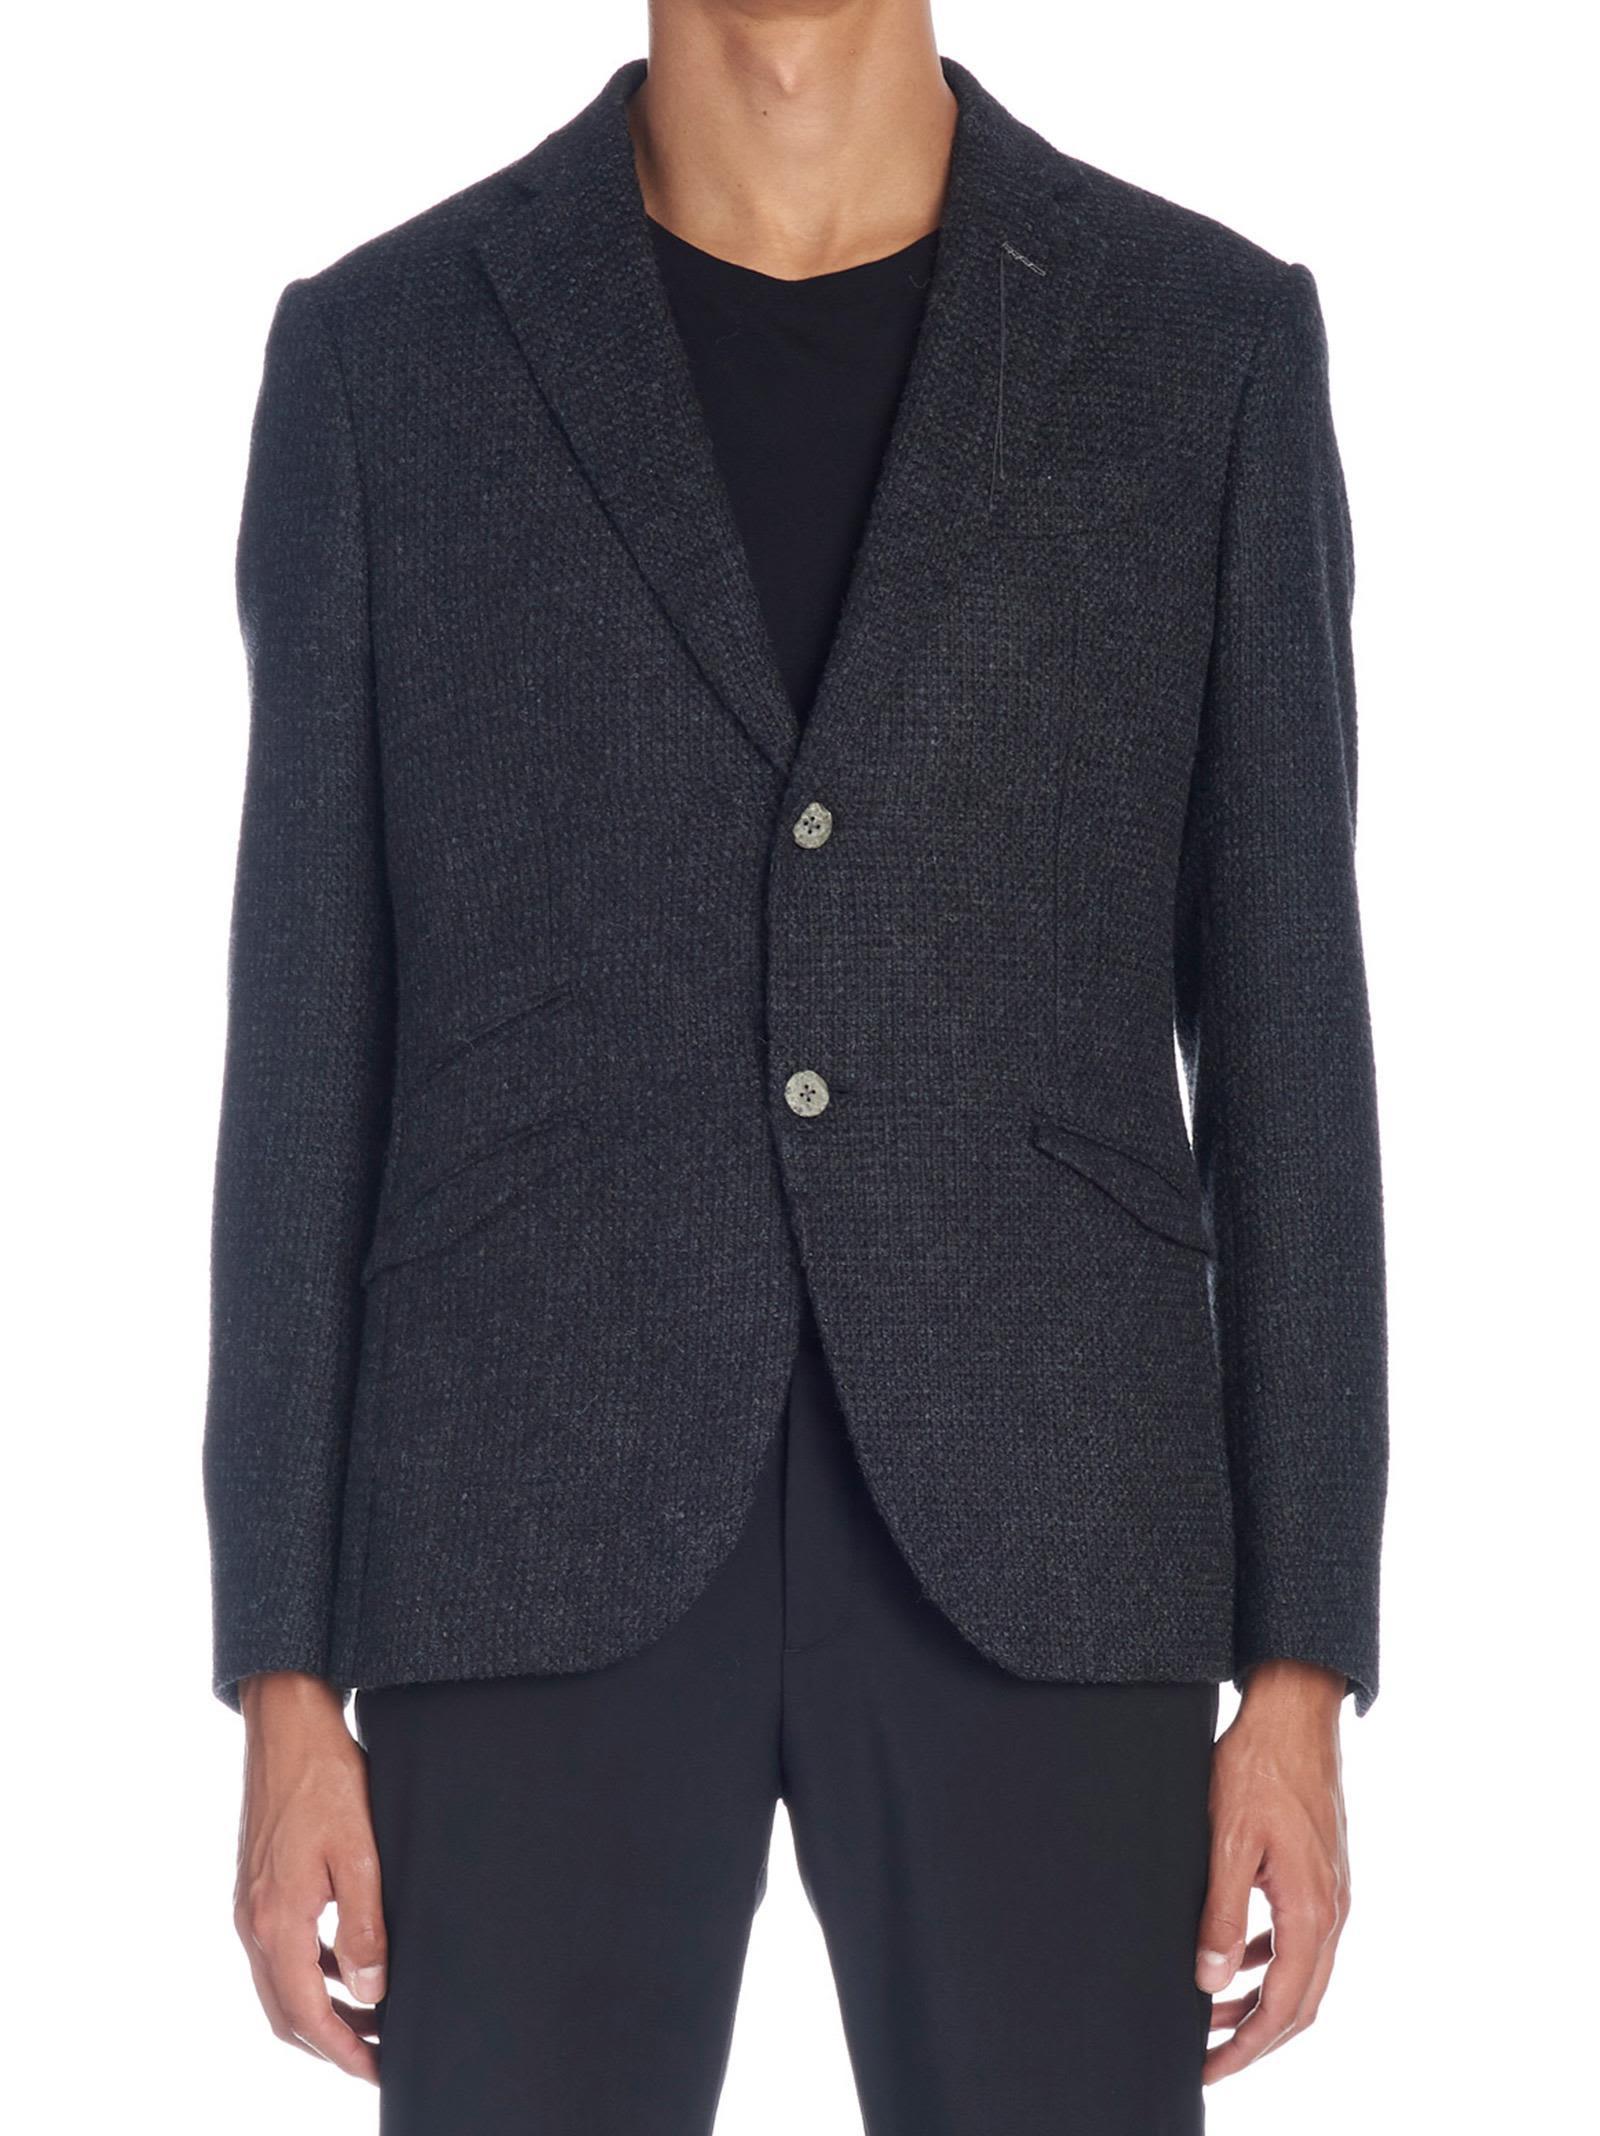 MAURIZIO MIRI 'Dustin' Jacket in Grey